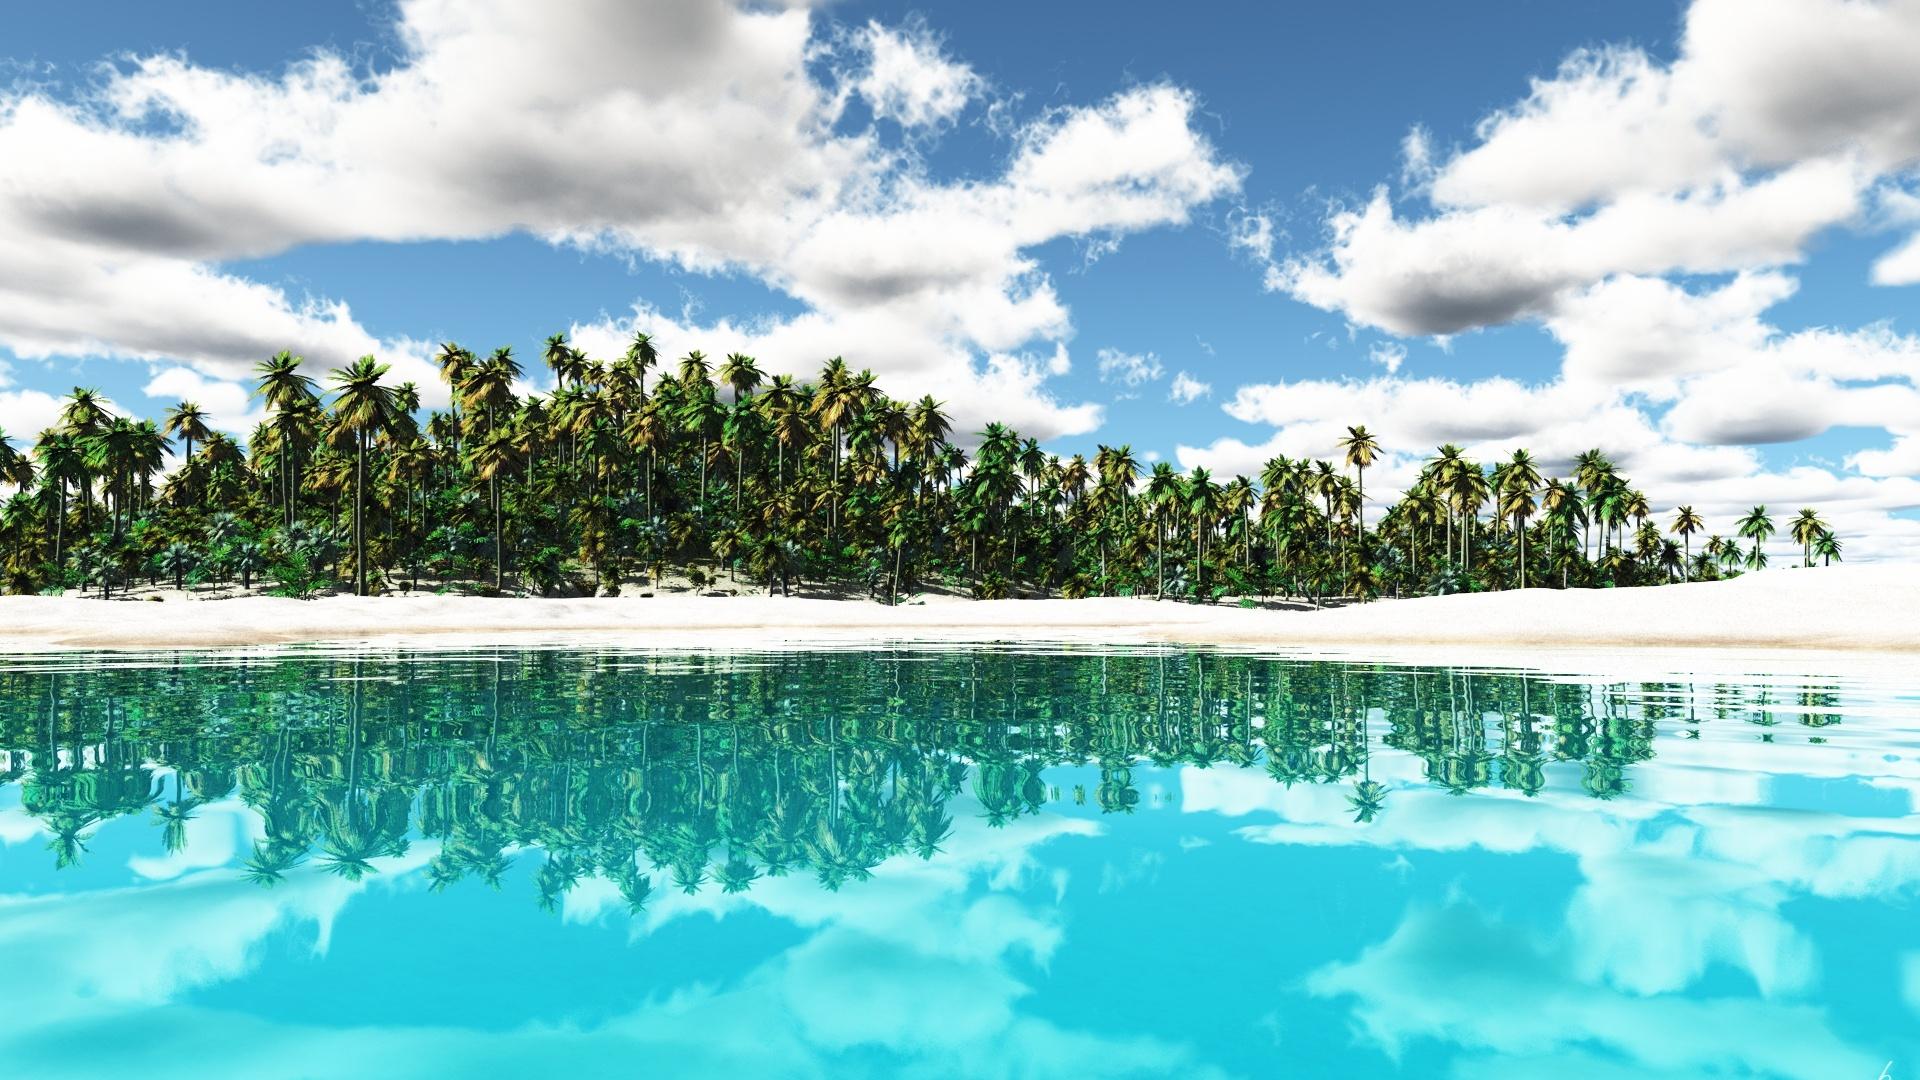 Tropical Island wallpaper   856662 1920x1080